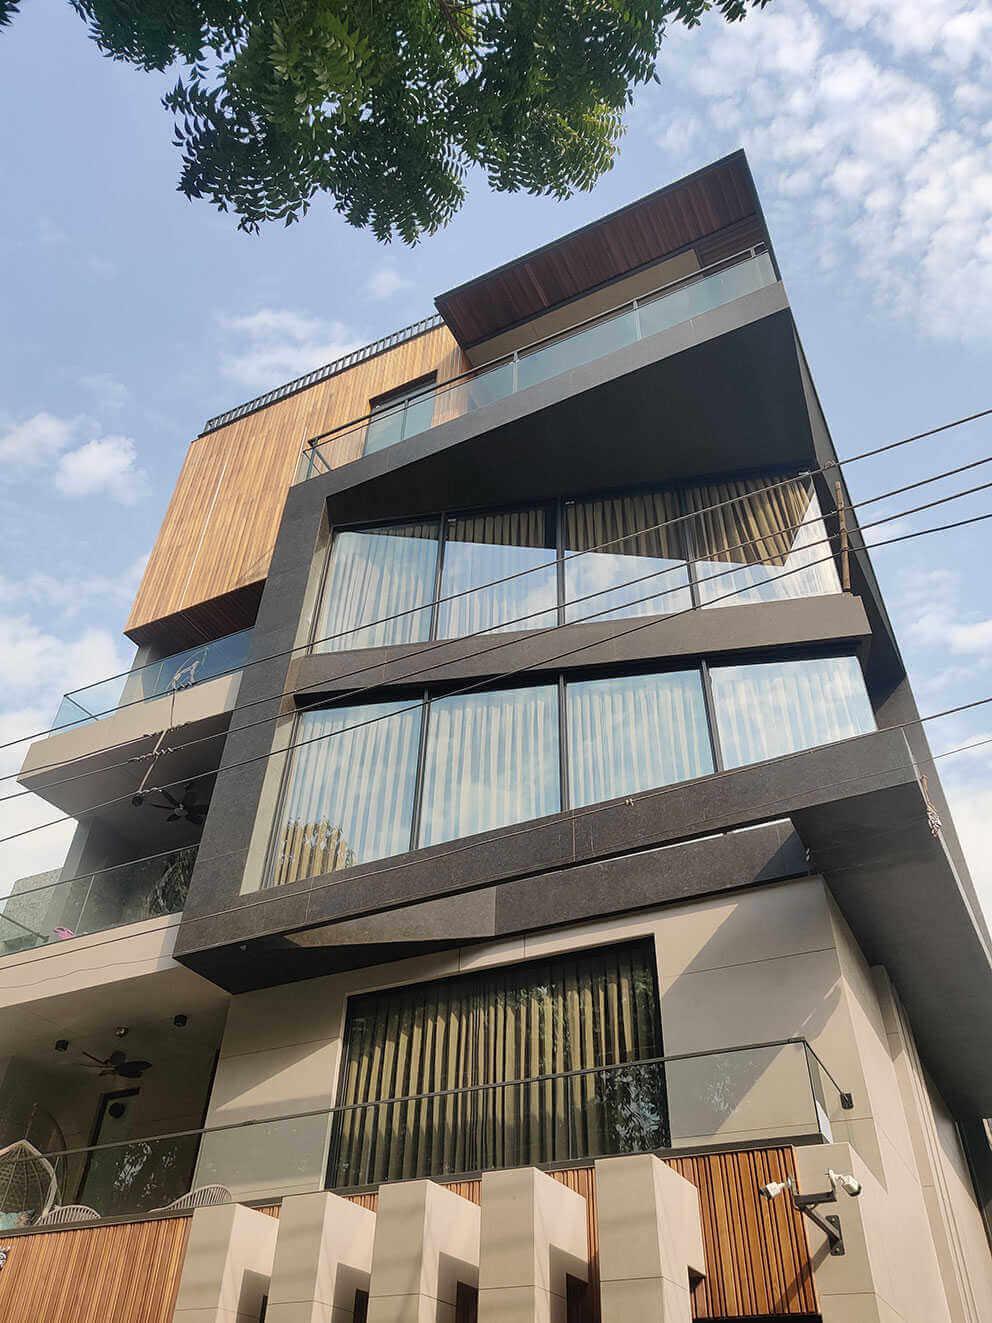 Edificio Delhi Coverlam 2 | Vivienda Unifamiliar Delhi, India